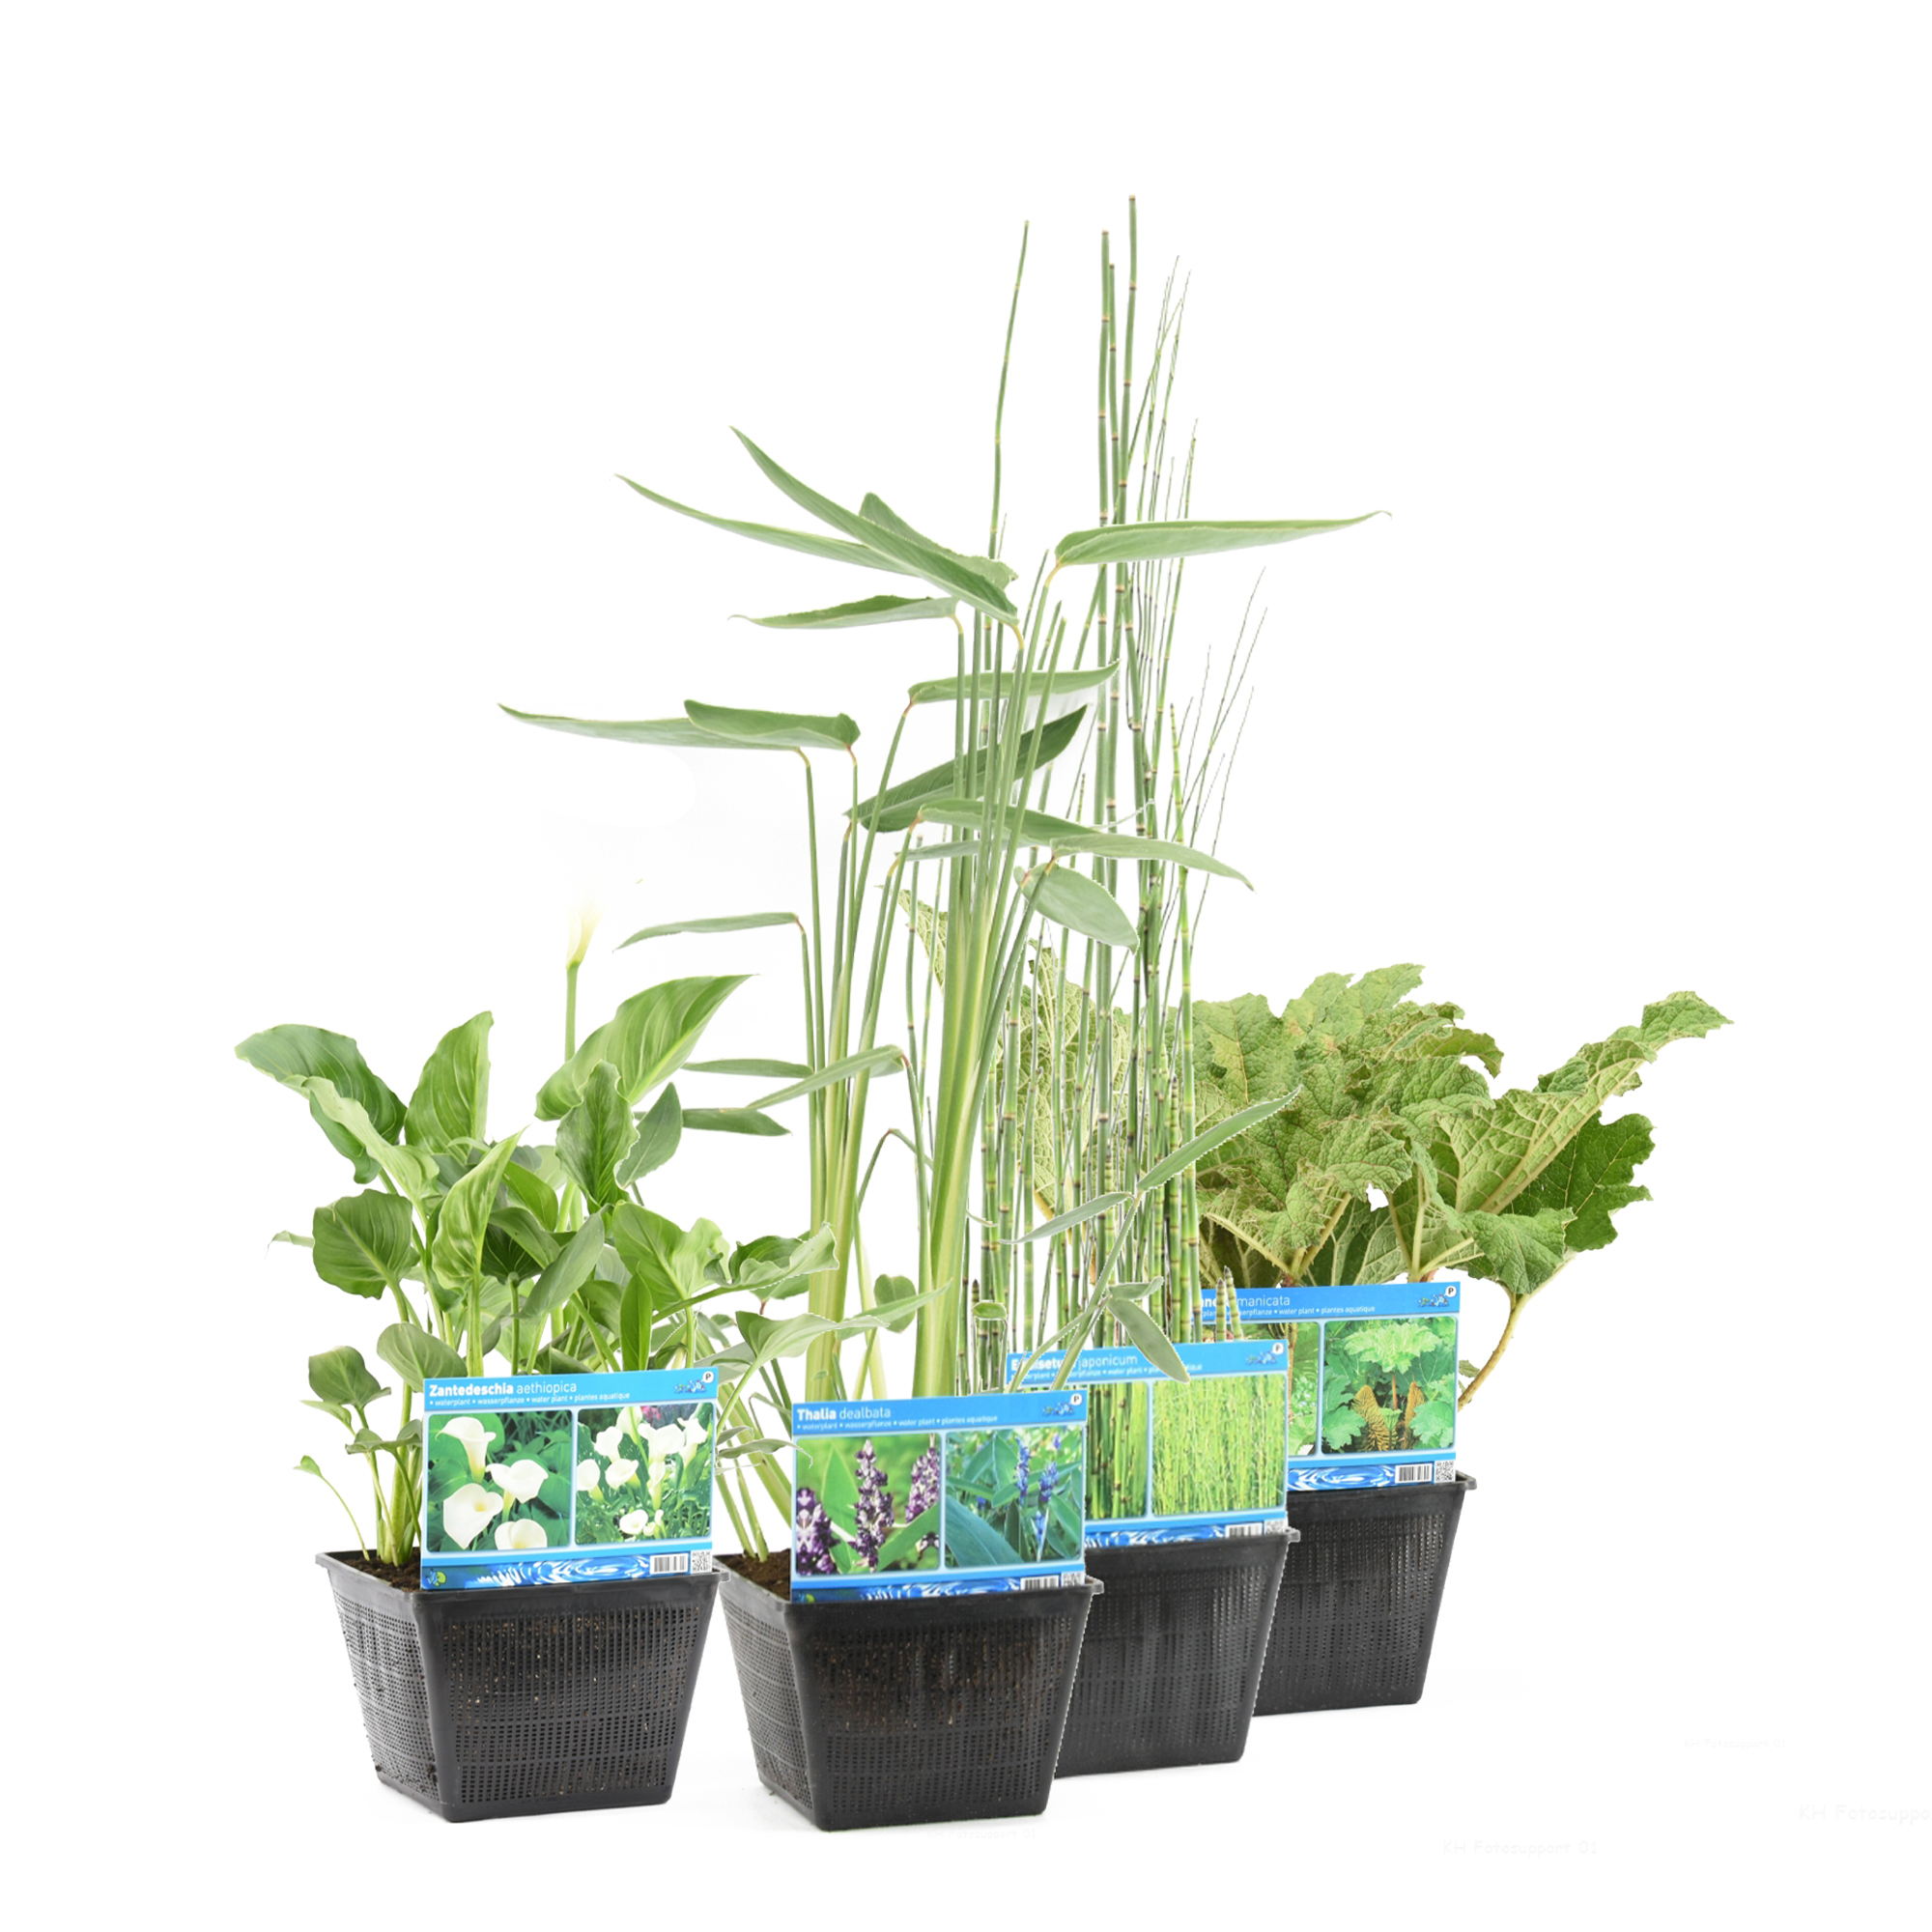 P28 waterplanten